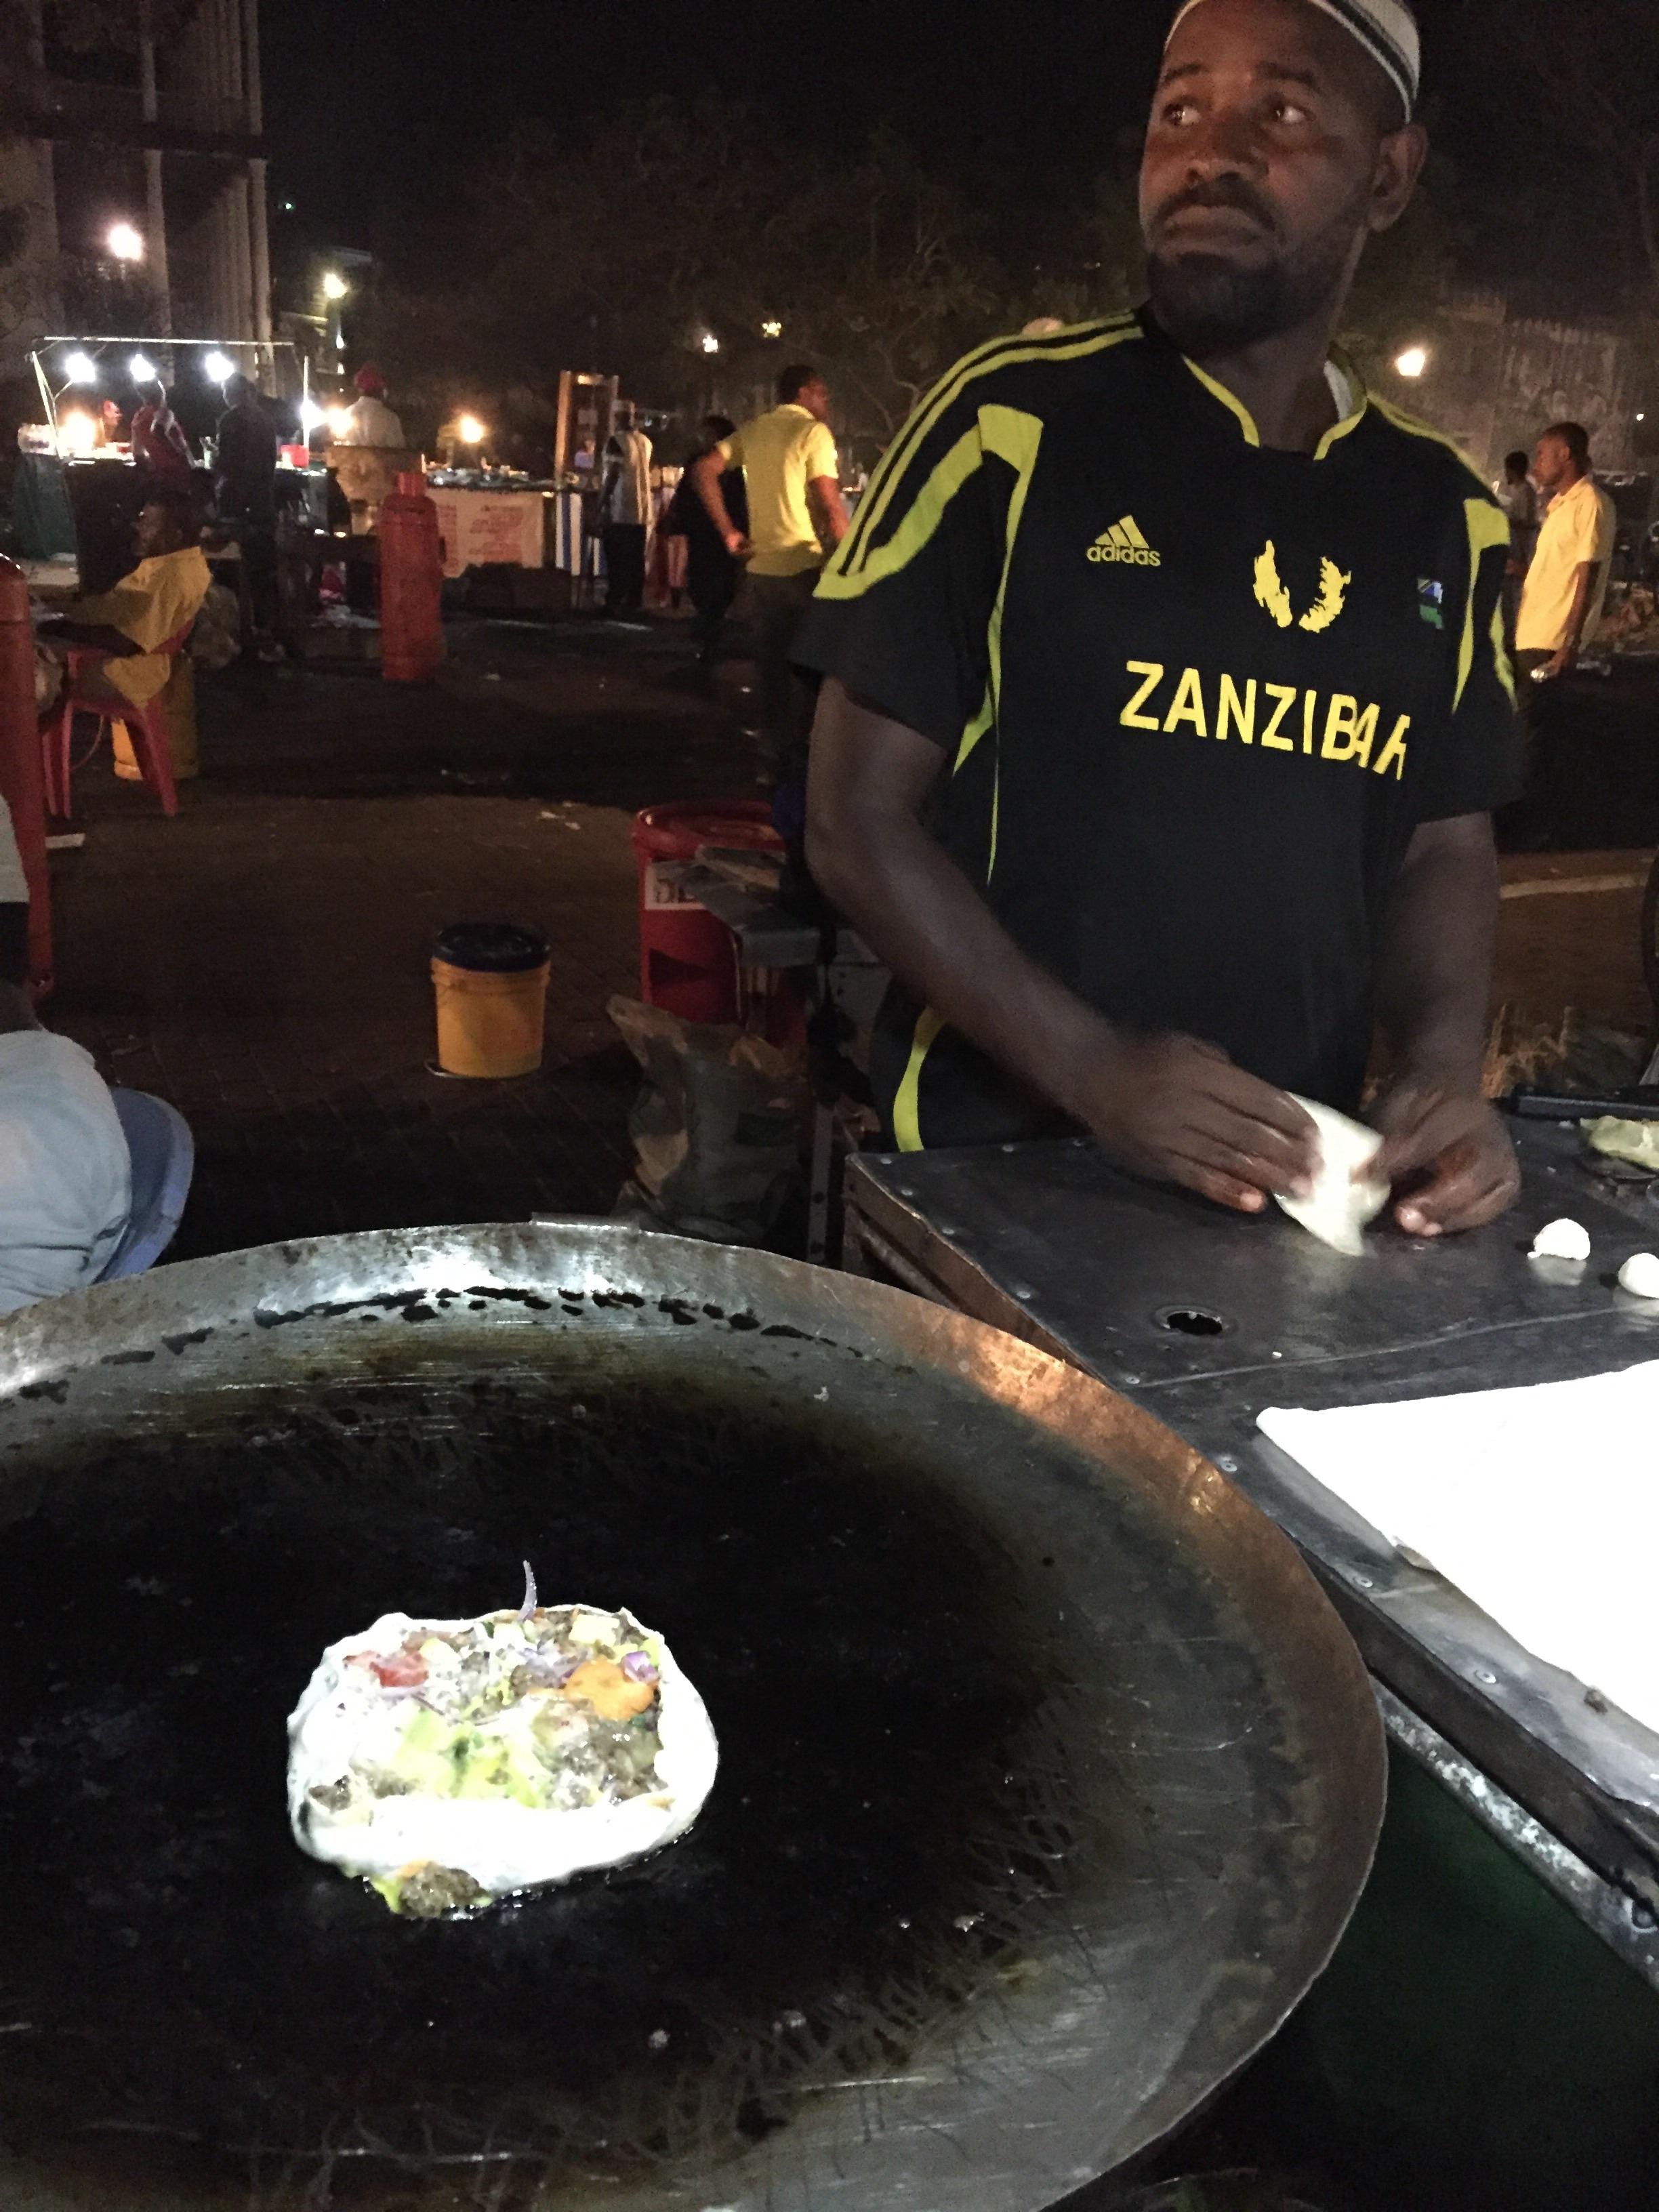 Zanzibar pizza. It's like thin crust Chicago style pizza. That's gotta be an oxymoron, right? Whateves, it's damn good.